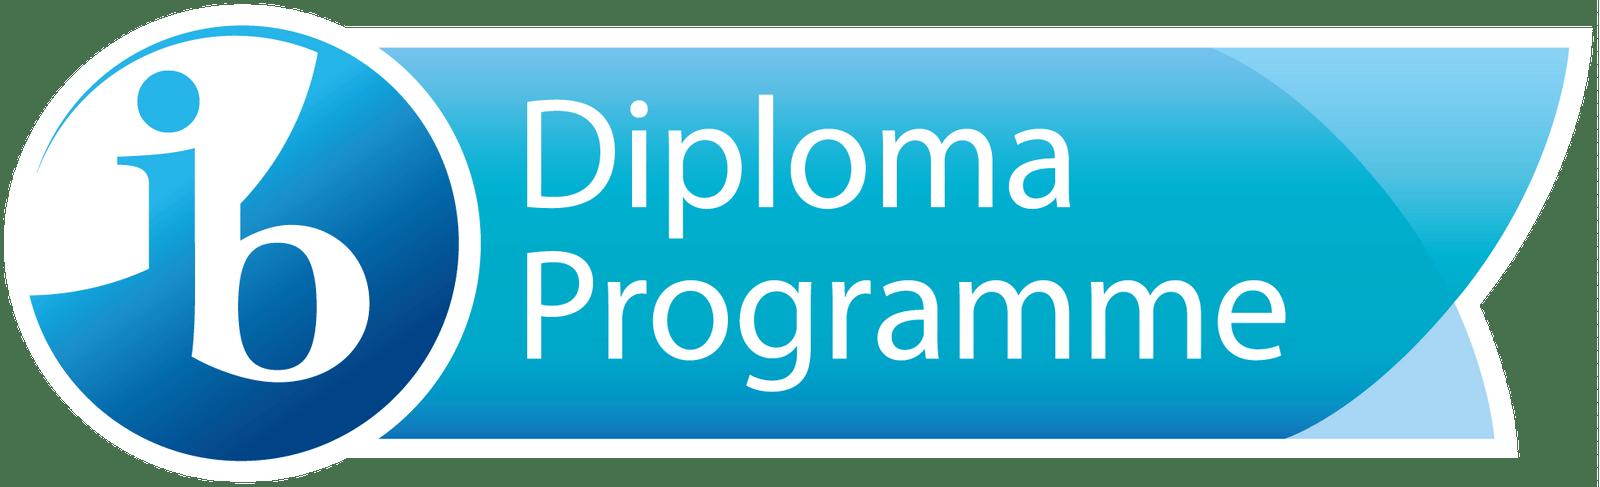 International Baccalaureate Diploma Program (IBDP) Logo at GIIS Dubai